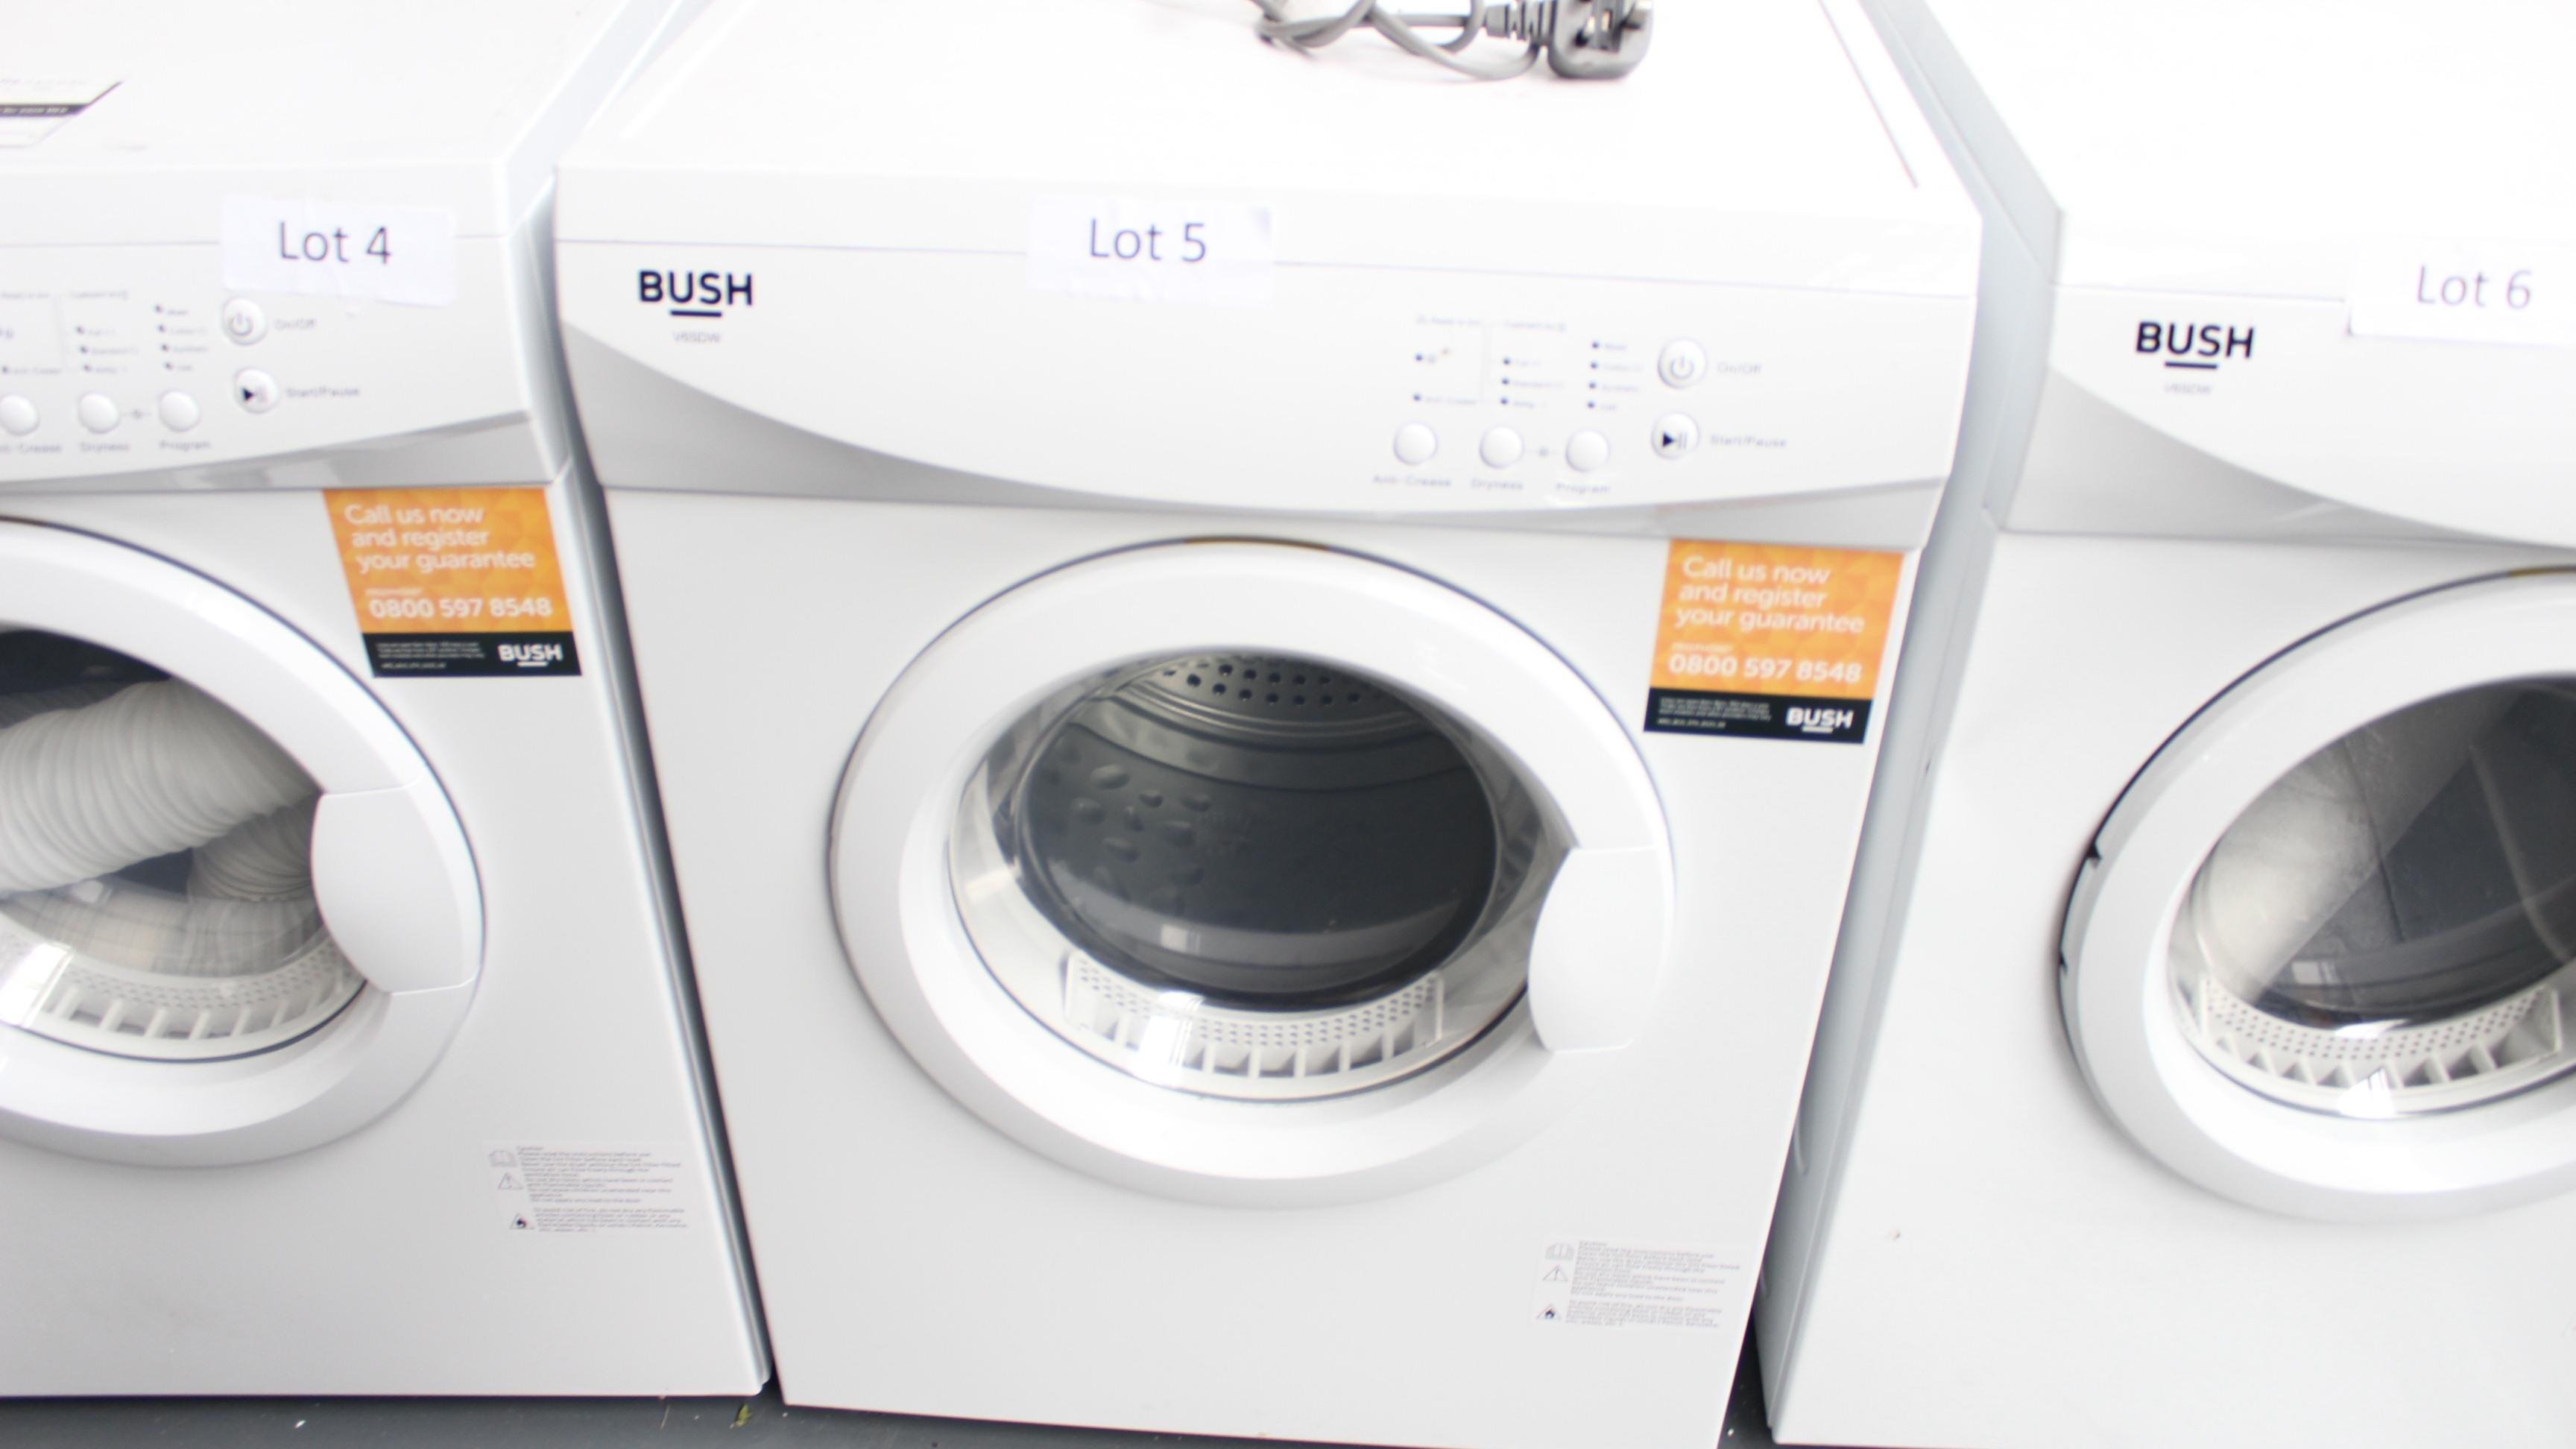 Lot 5 - Bush V6SDW Tumble Dryer Customer Returns